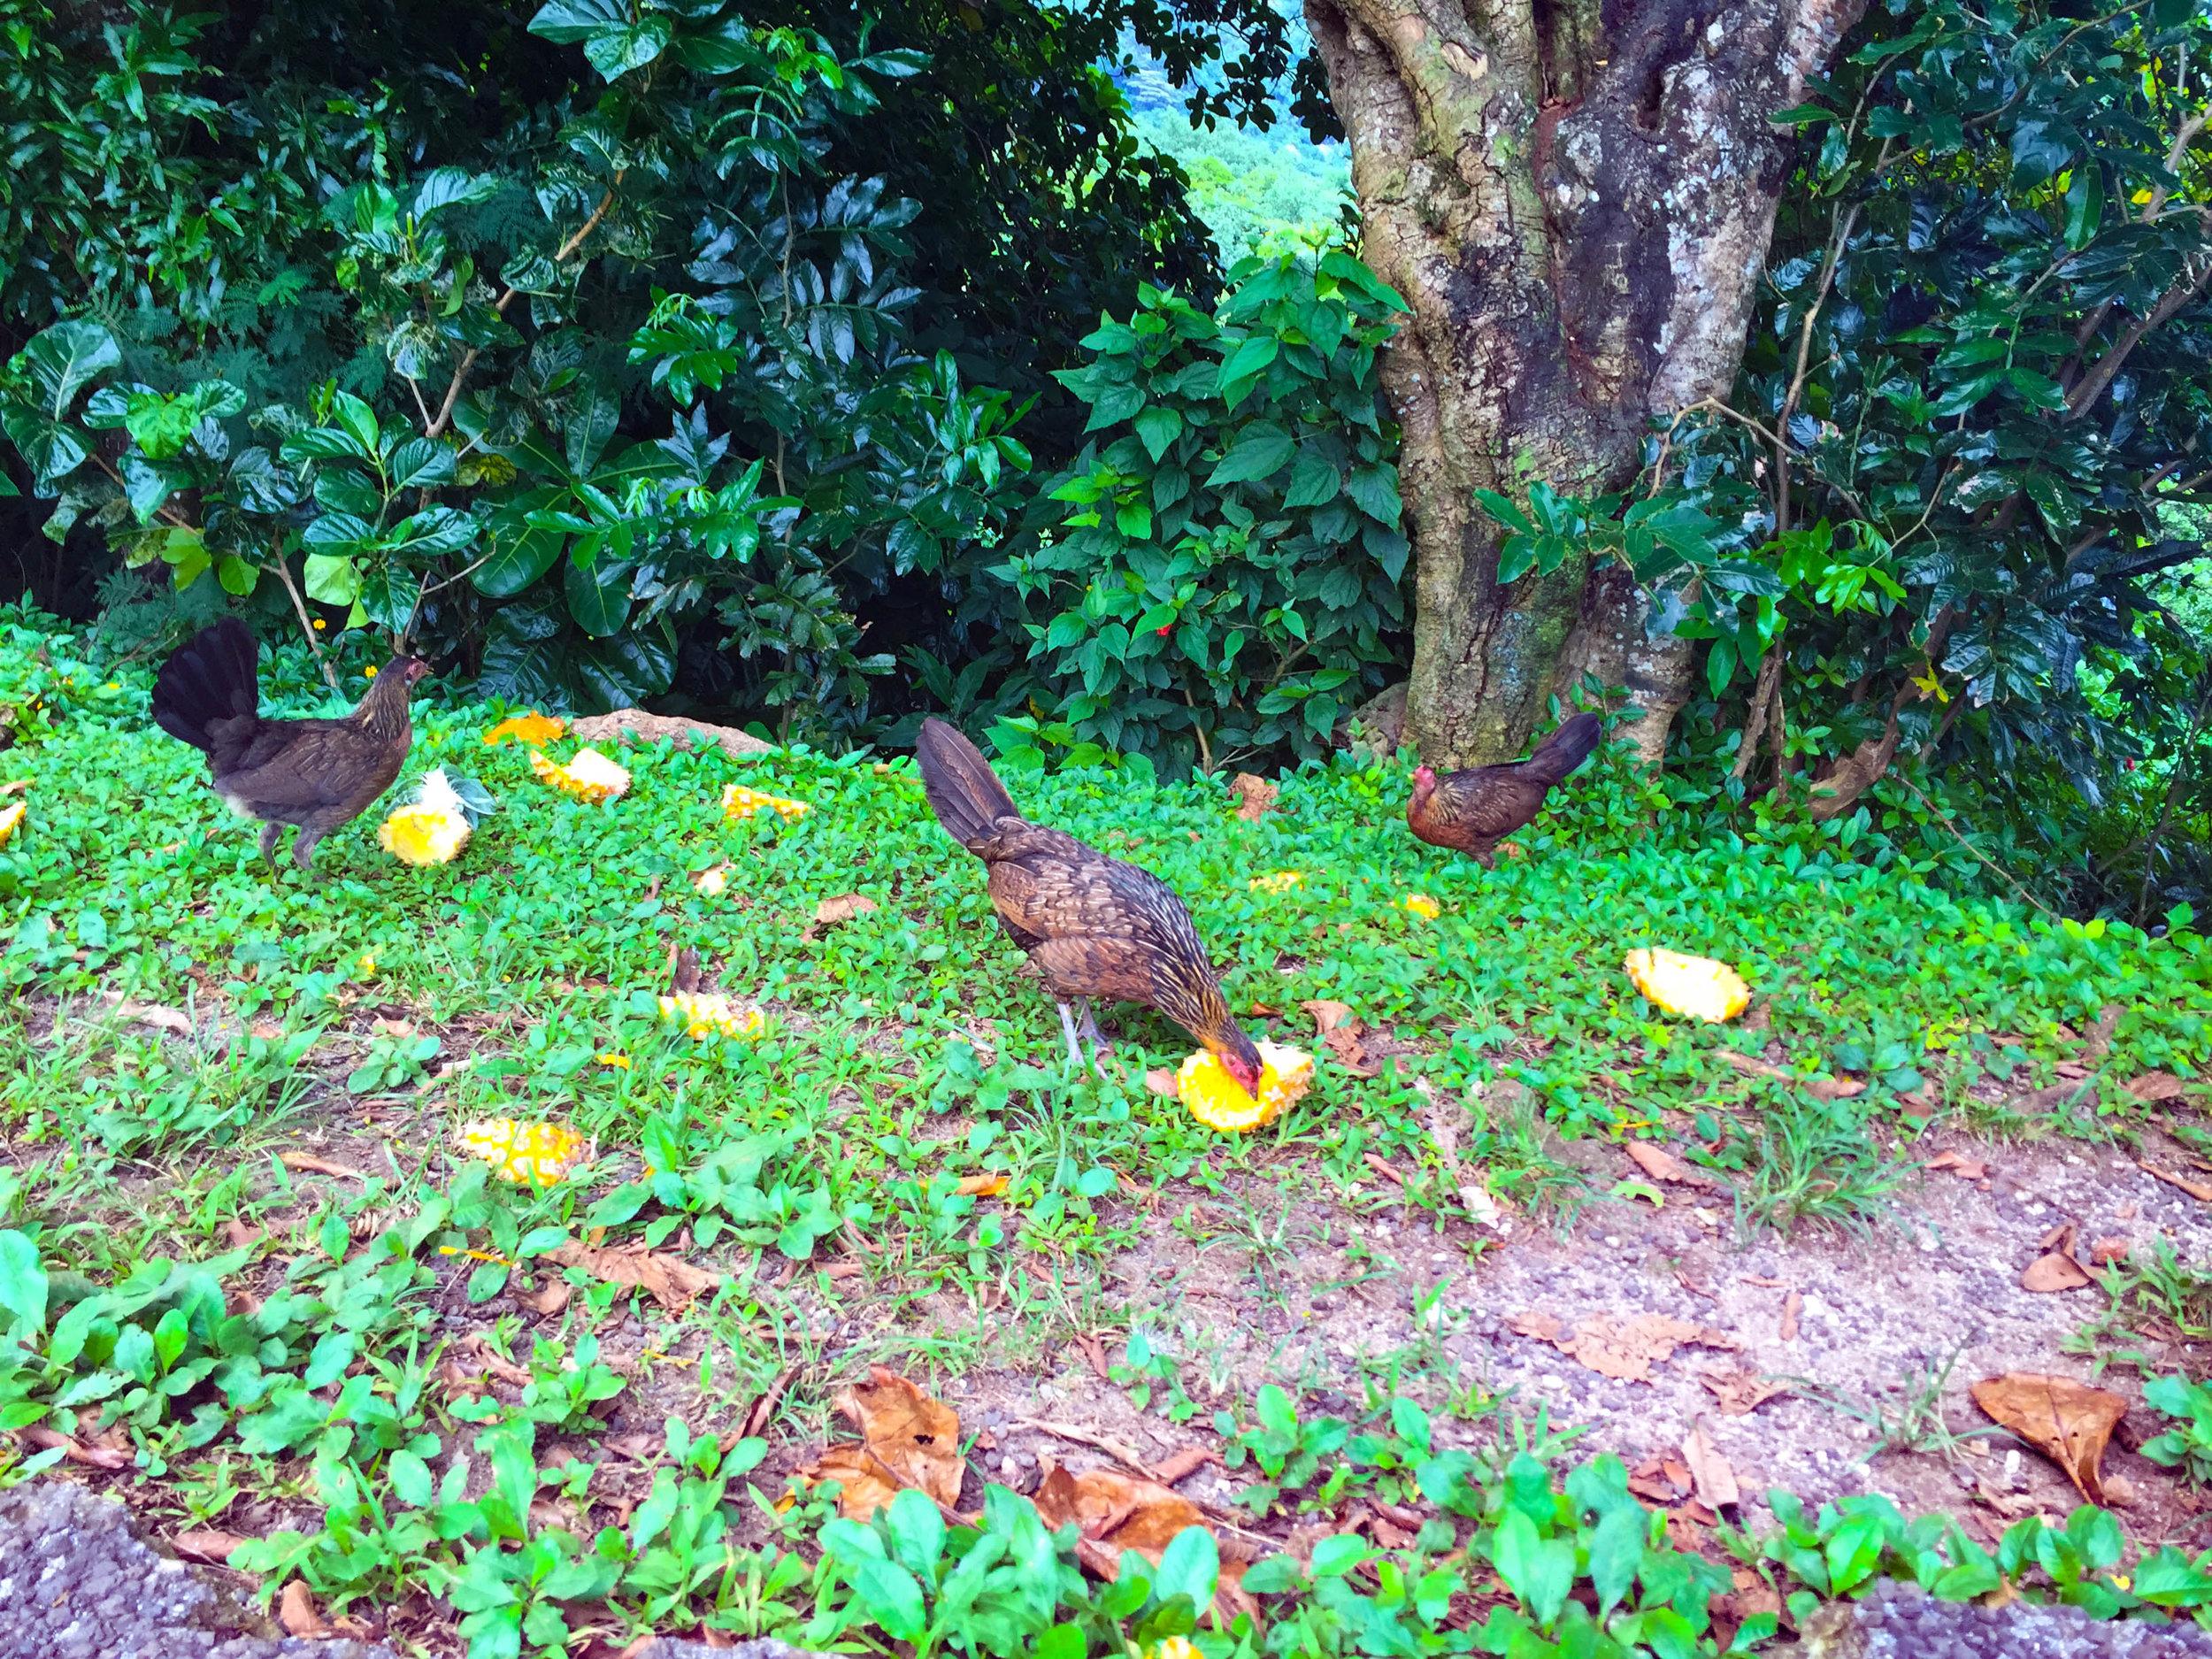 Belvedere views in Moorea - chickens